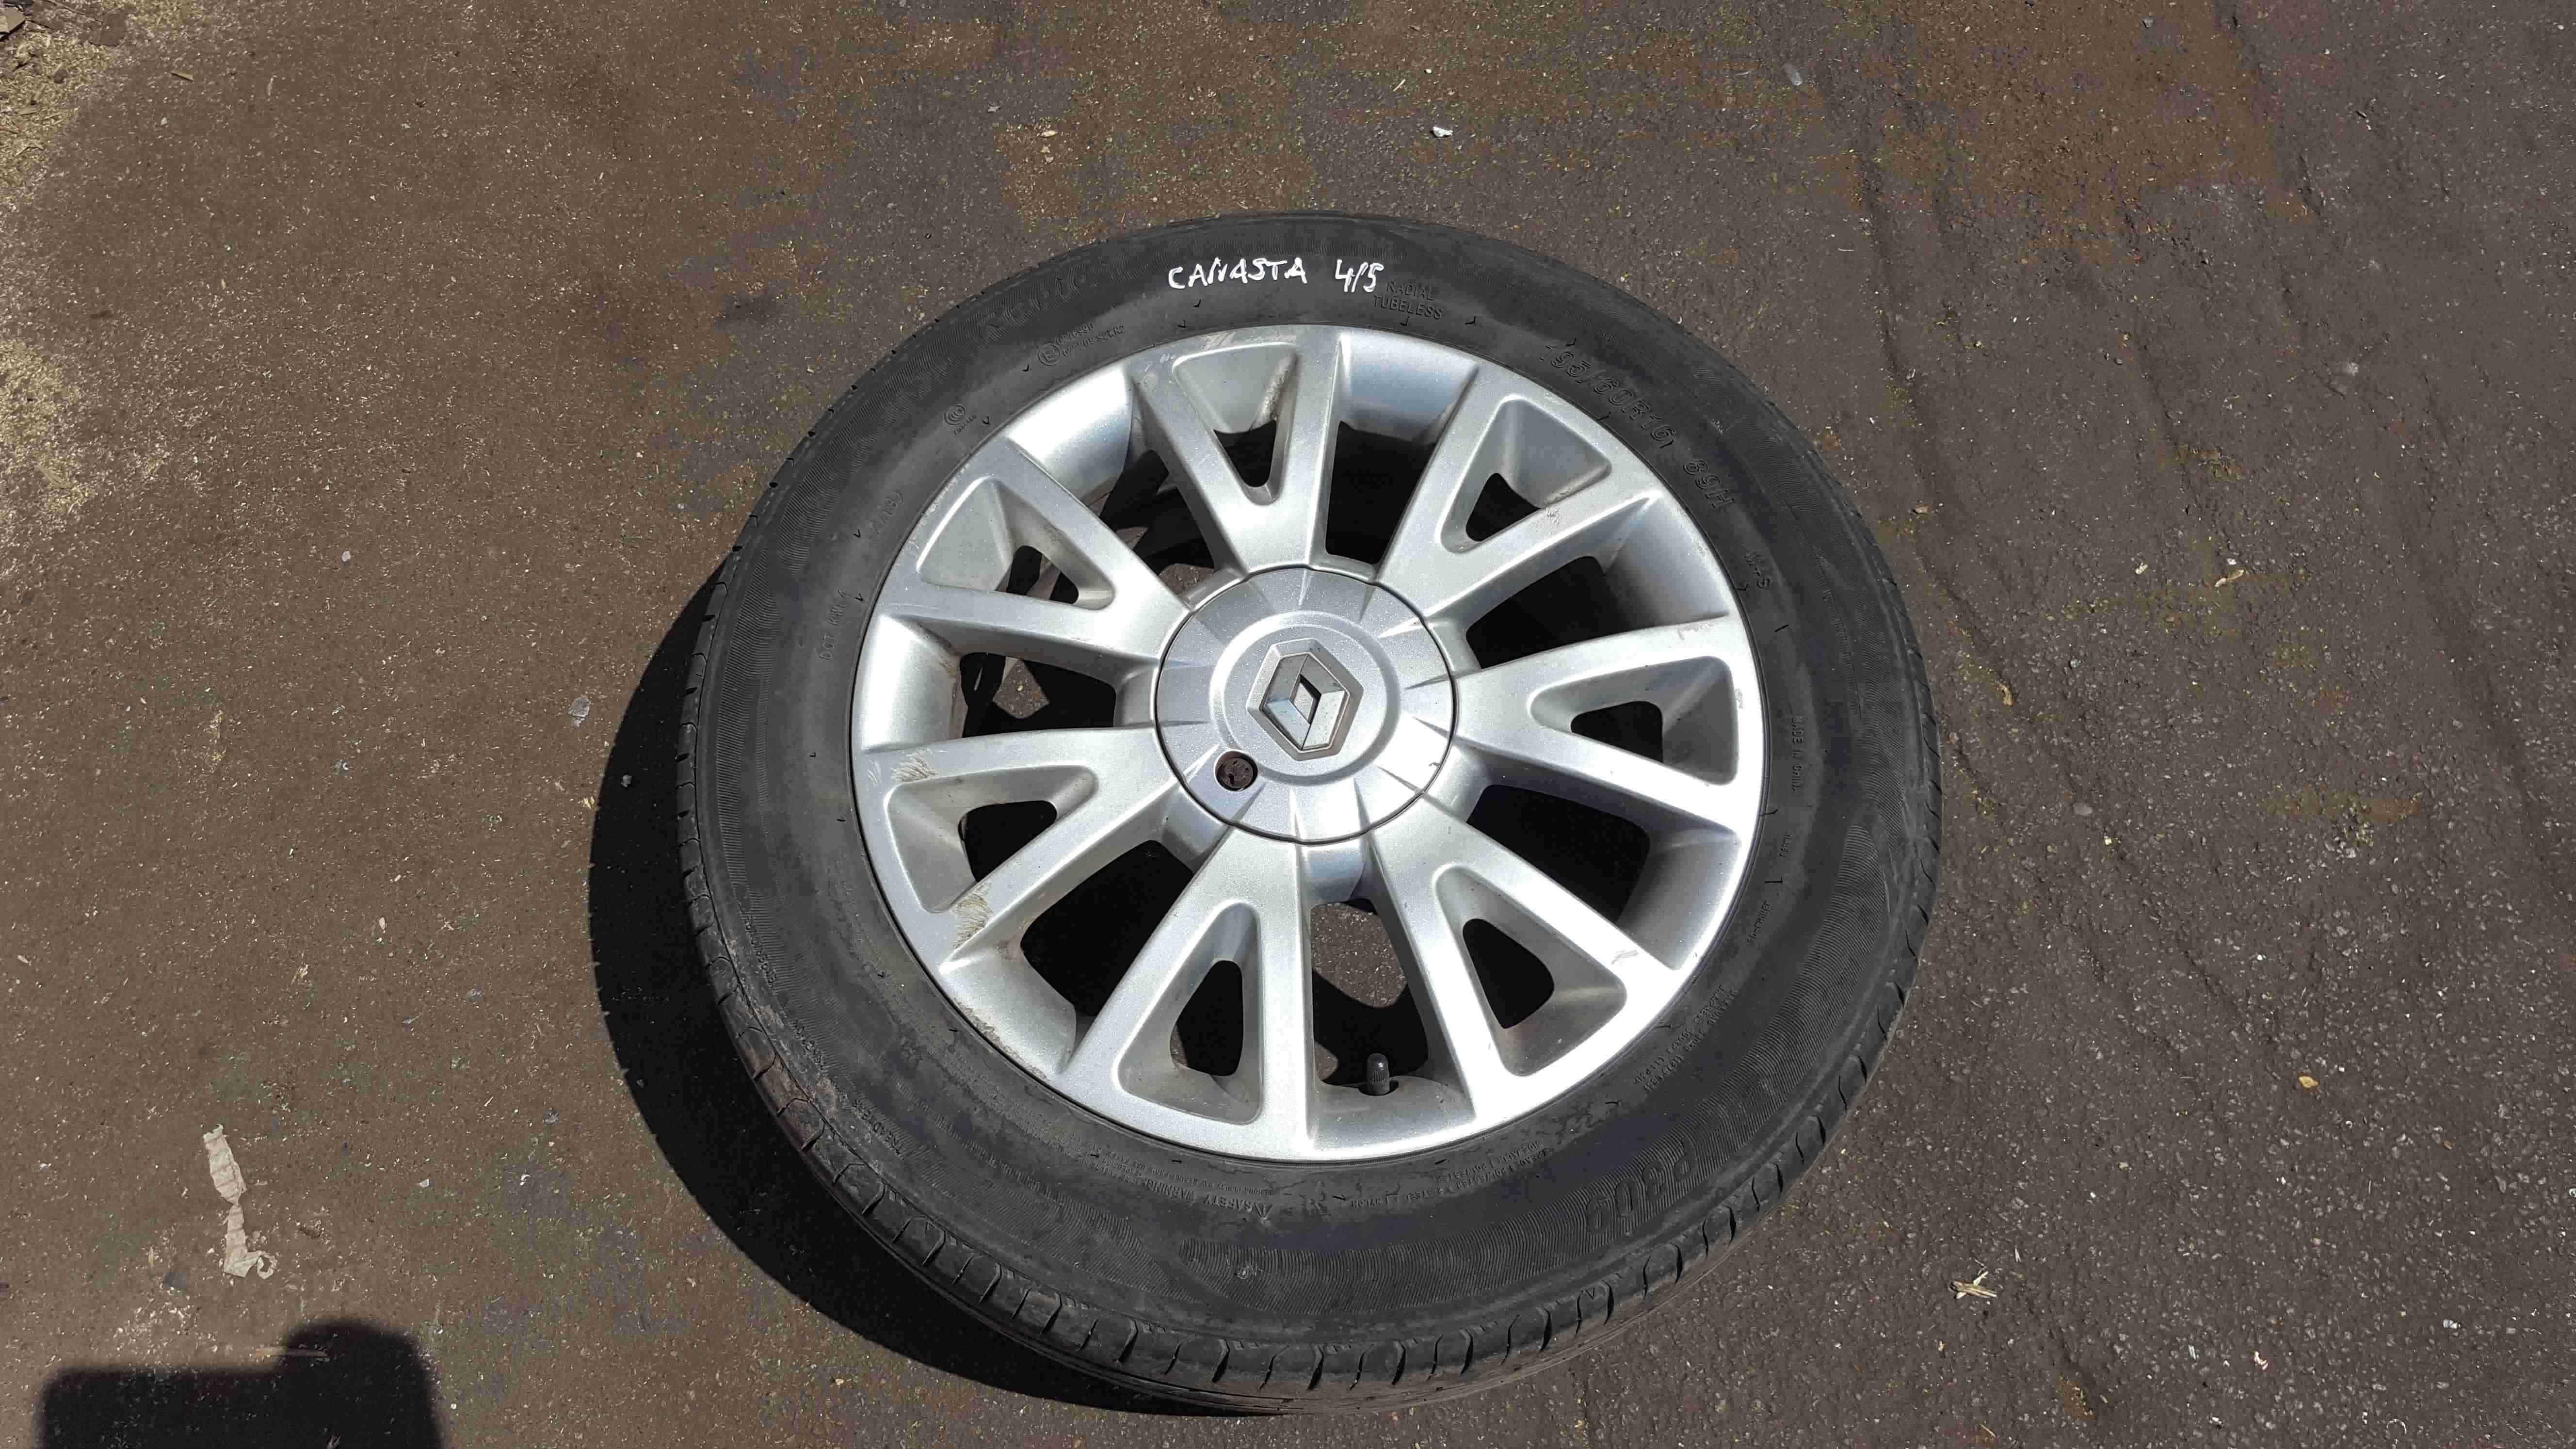 Renault Clio MK3 20052012 Canasta Alloy Wheel 16inch  Tyre 195 60 16 5mm